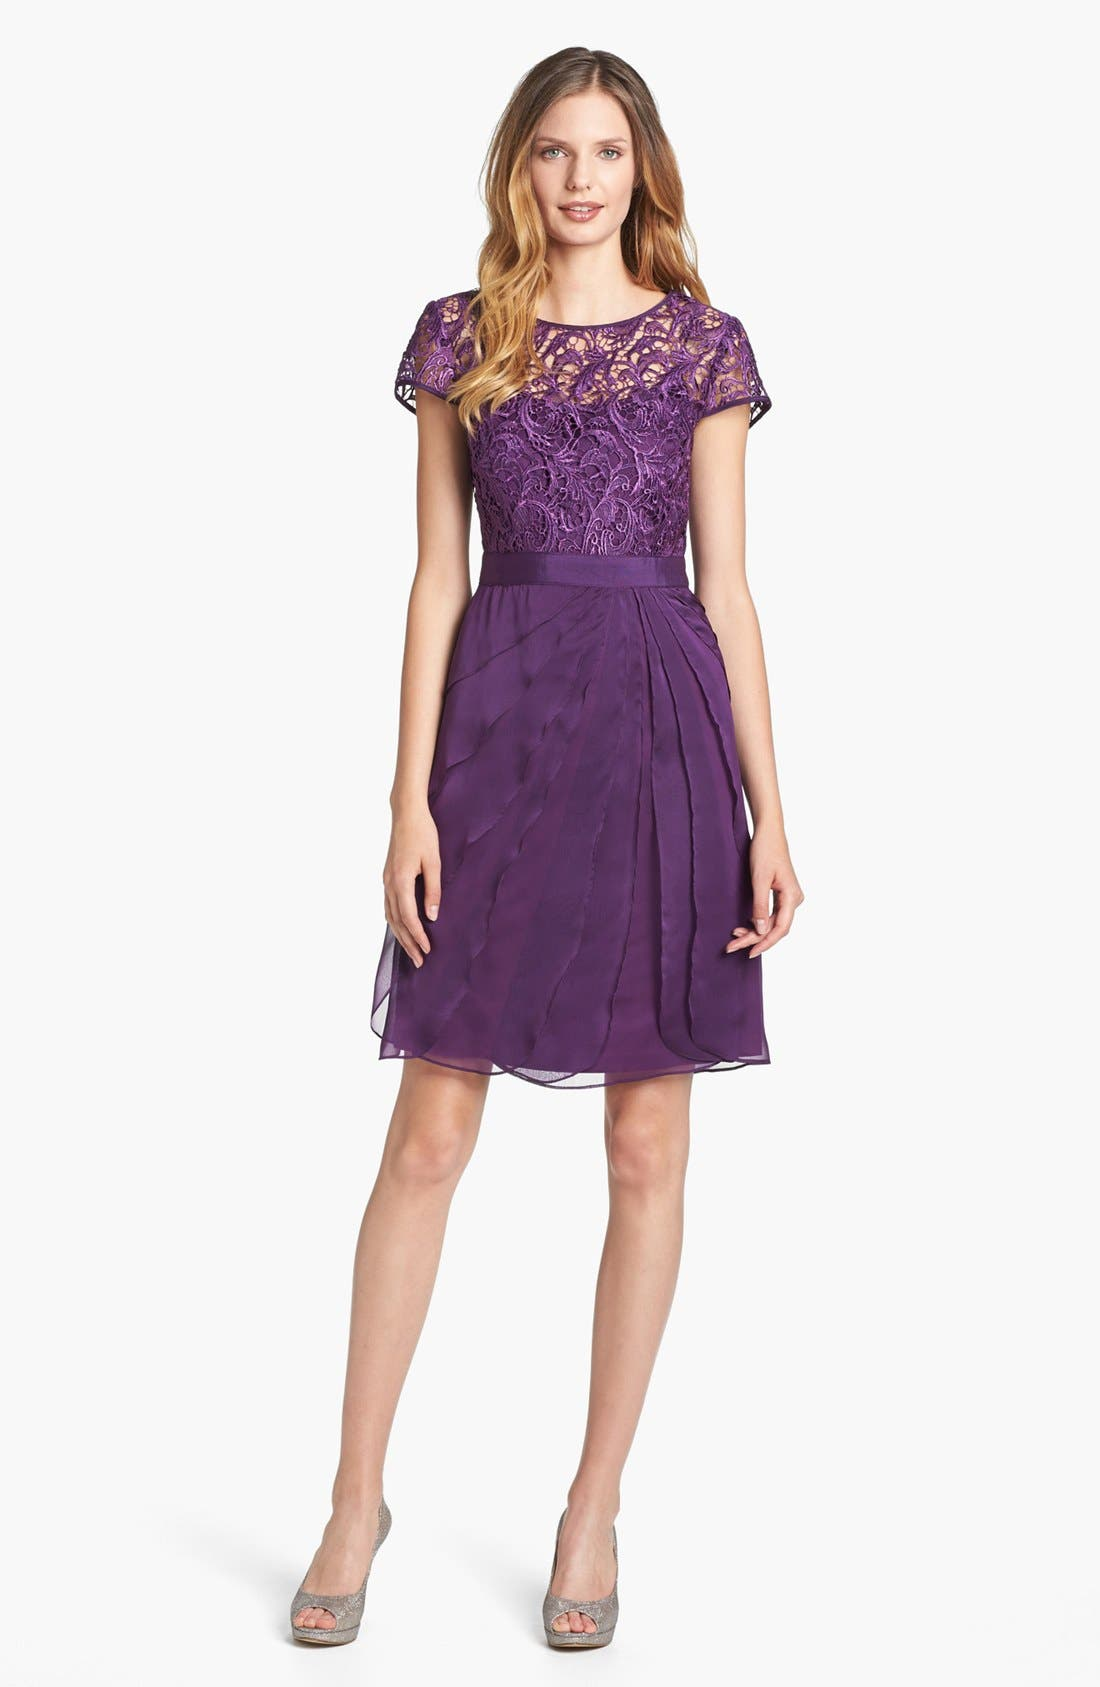 Alternate Image 1 Selected - Adrianna Papell Lace & Tiered Chiffon Dress (Regular & Petite)